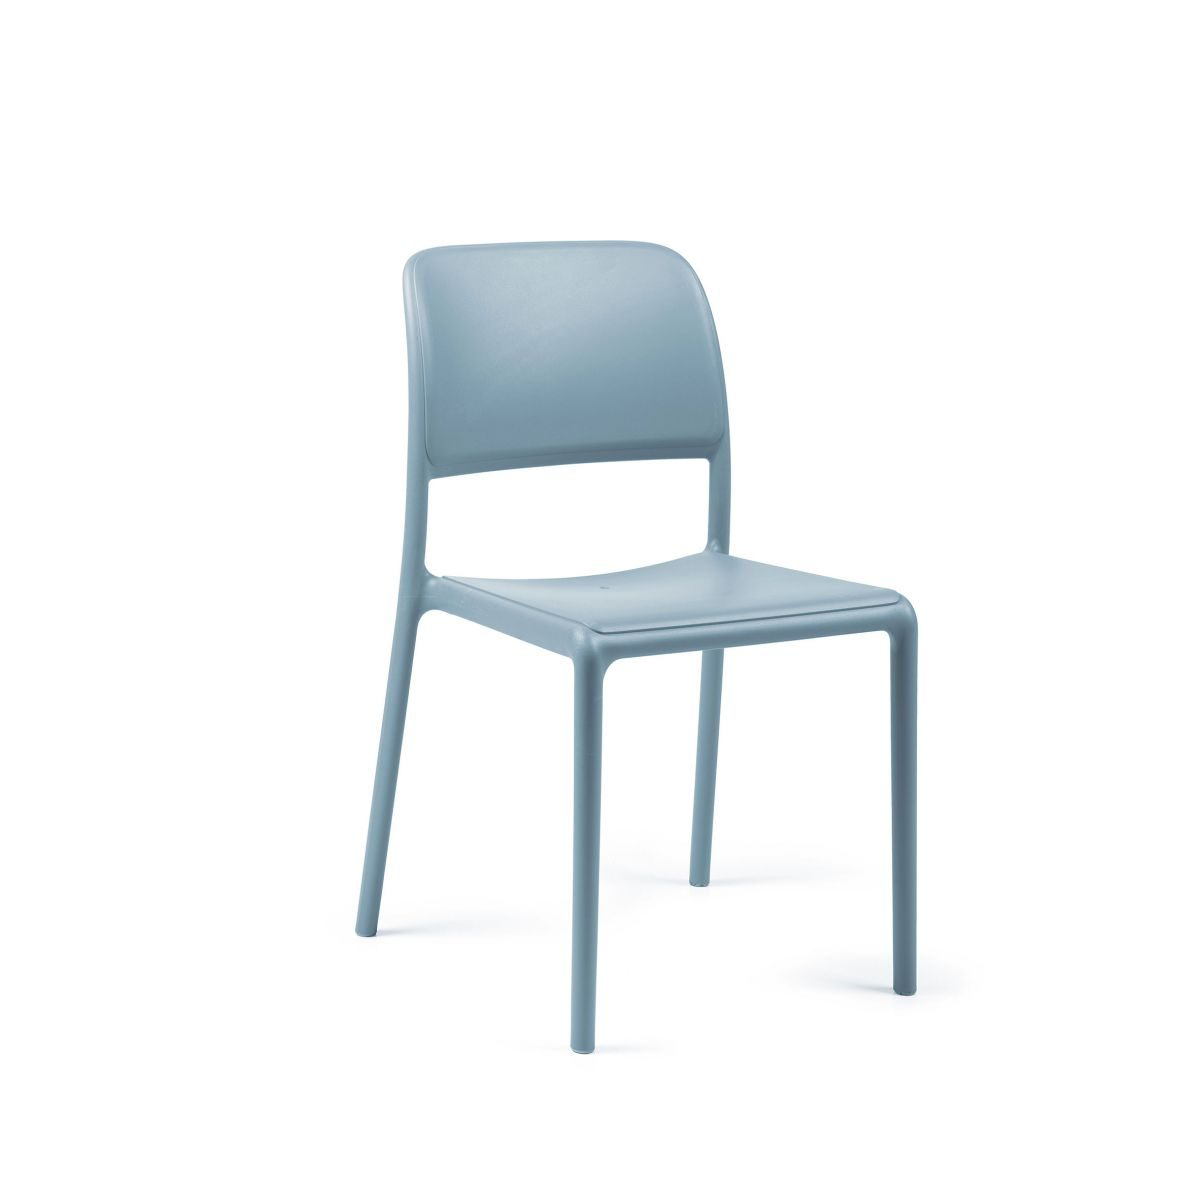 chaise de jardin coloree design riva bistrot nardi gespeed ce wQE4Pi9iaz 1200x1200